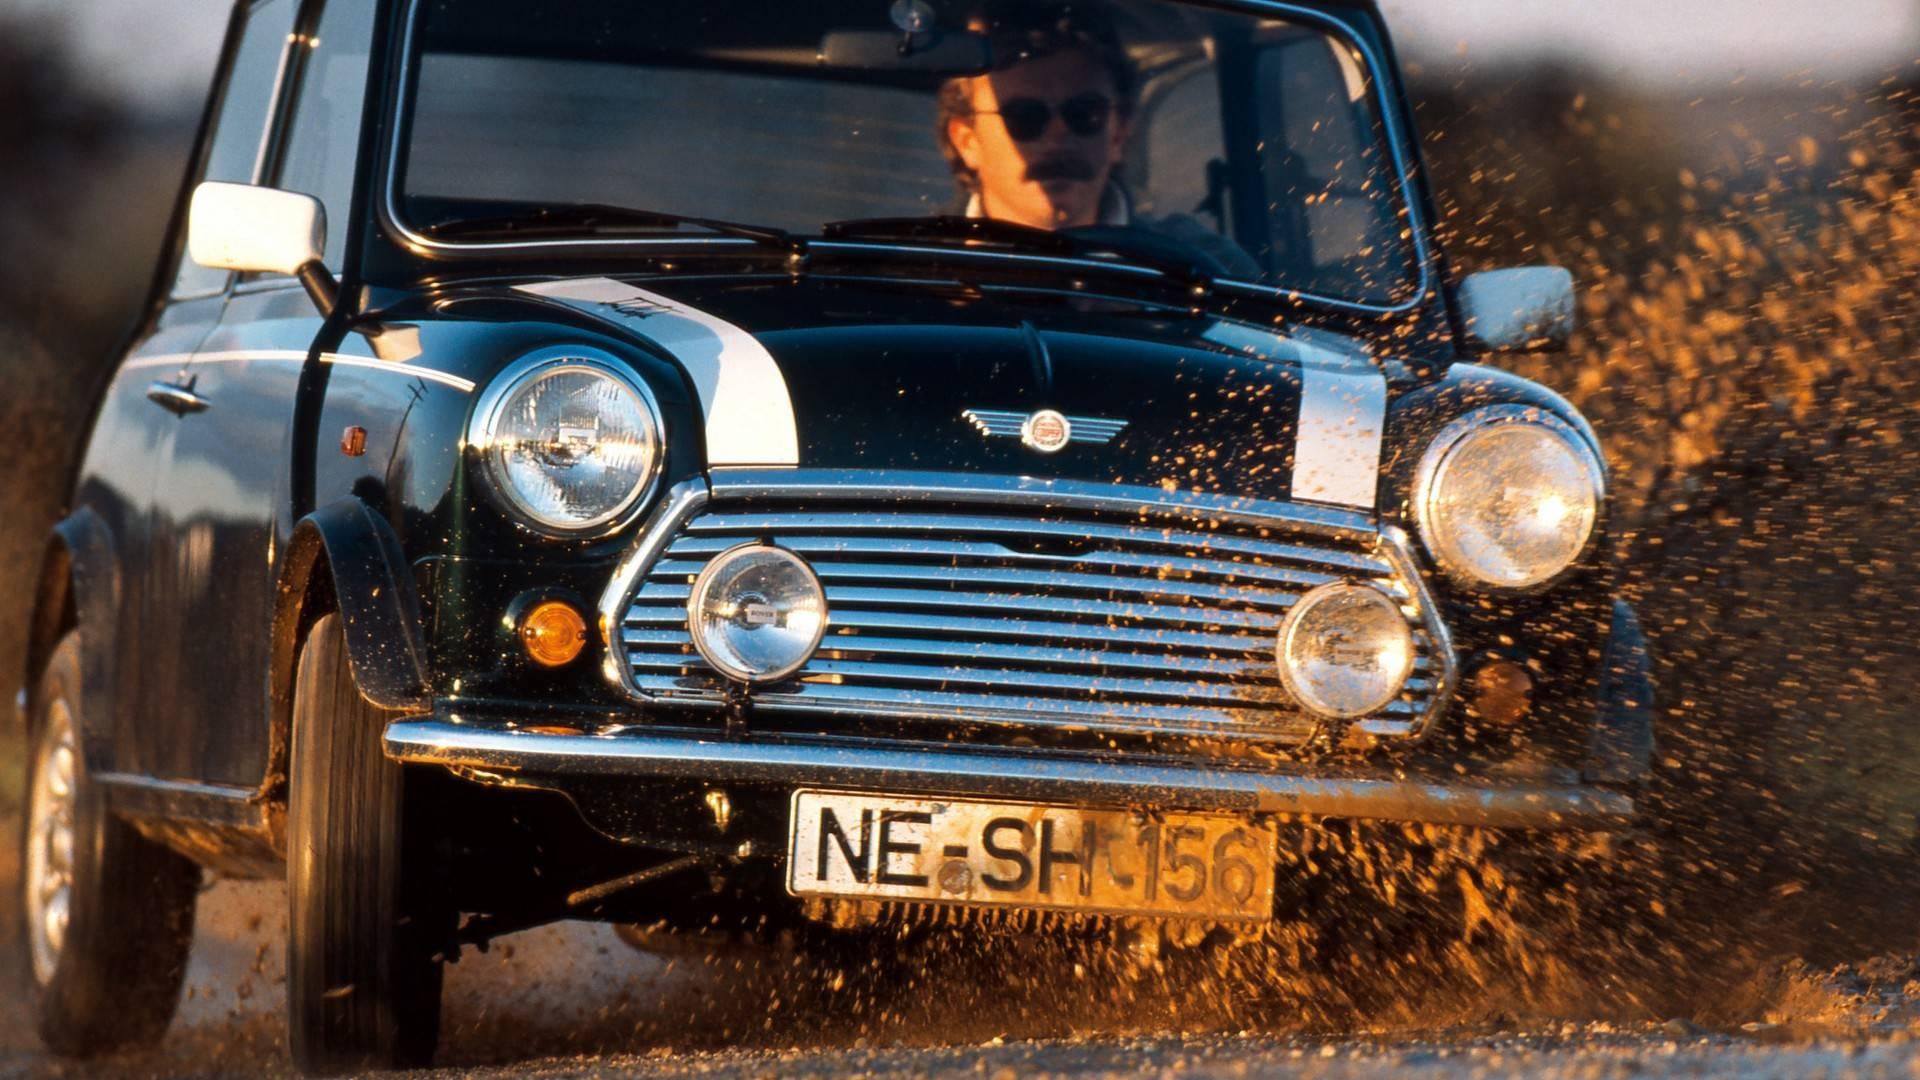 5a9414b59b052 classic mini through the years چرا ما کلاسیک مینی را دوست داریم   اجاره ماشین